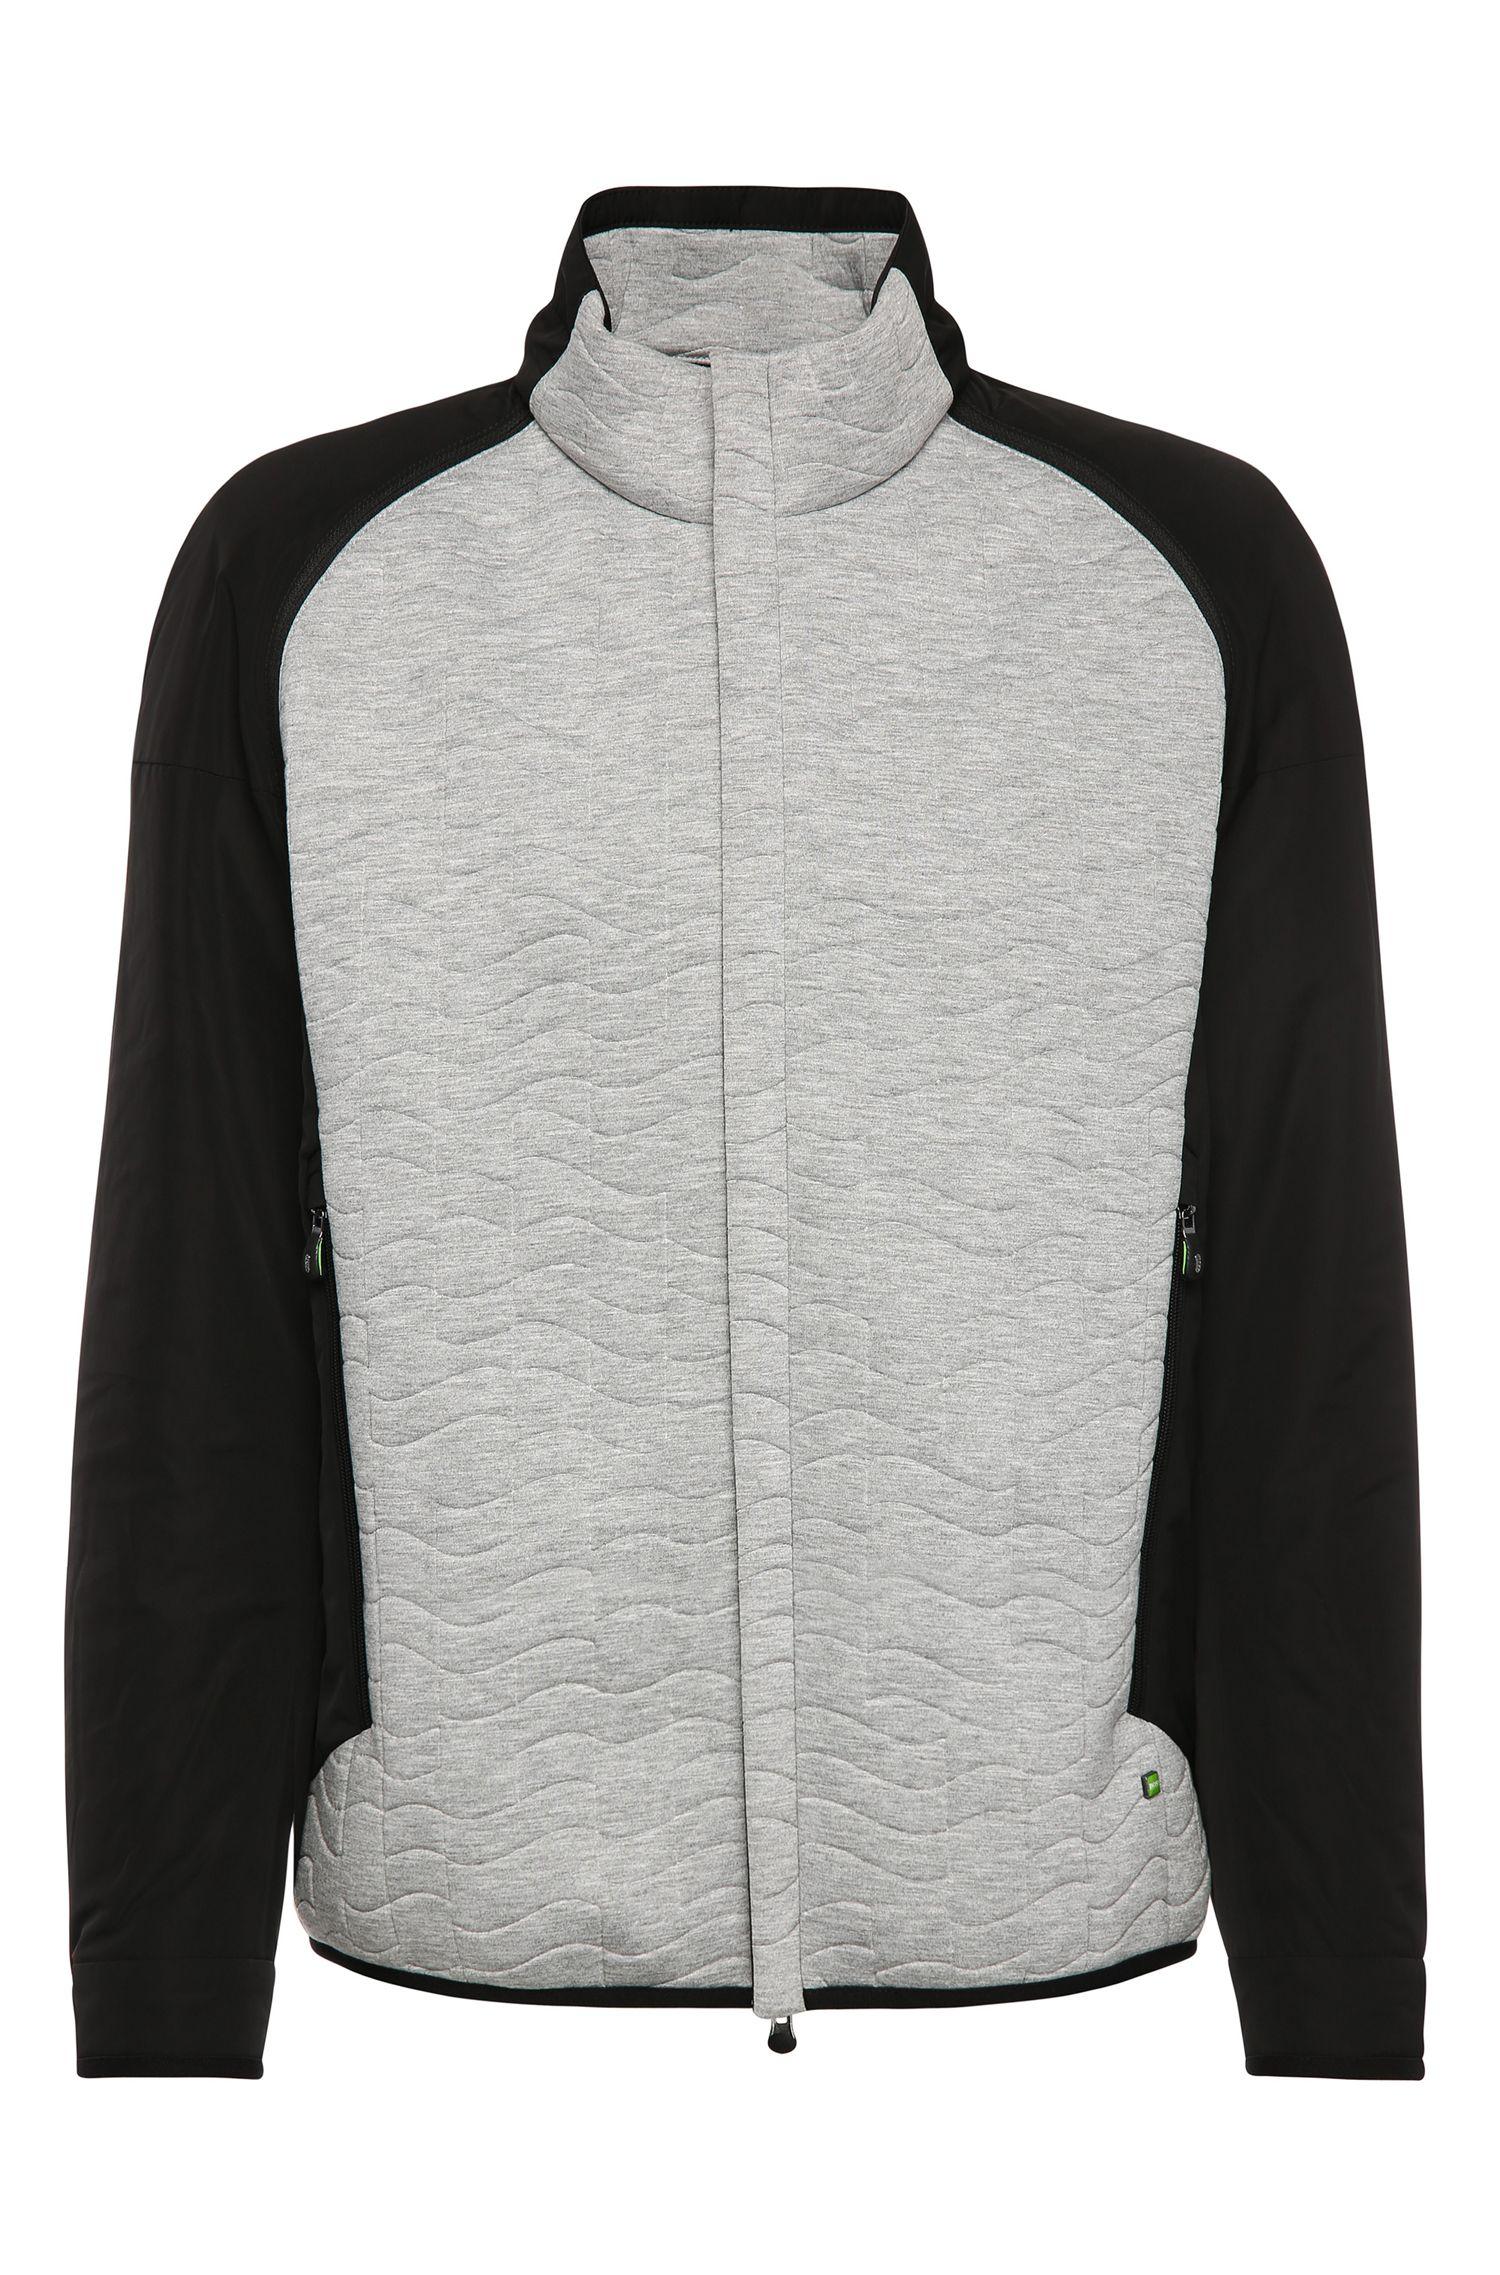 Quilted Zip-Off Sleeve Jacket | Jevian